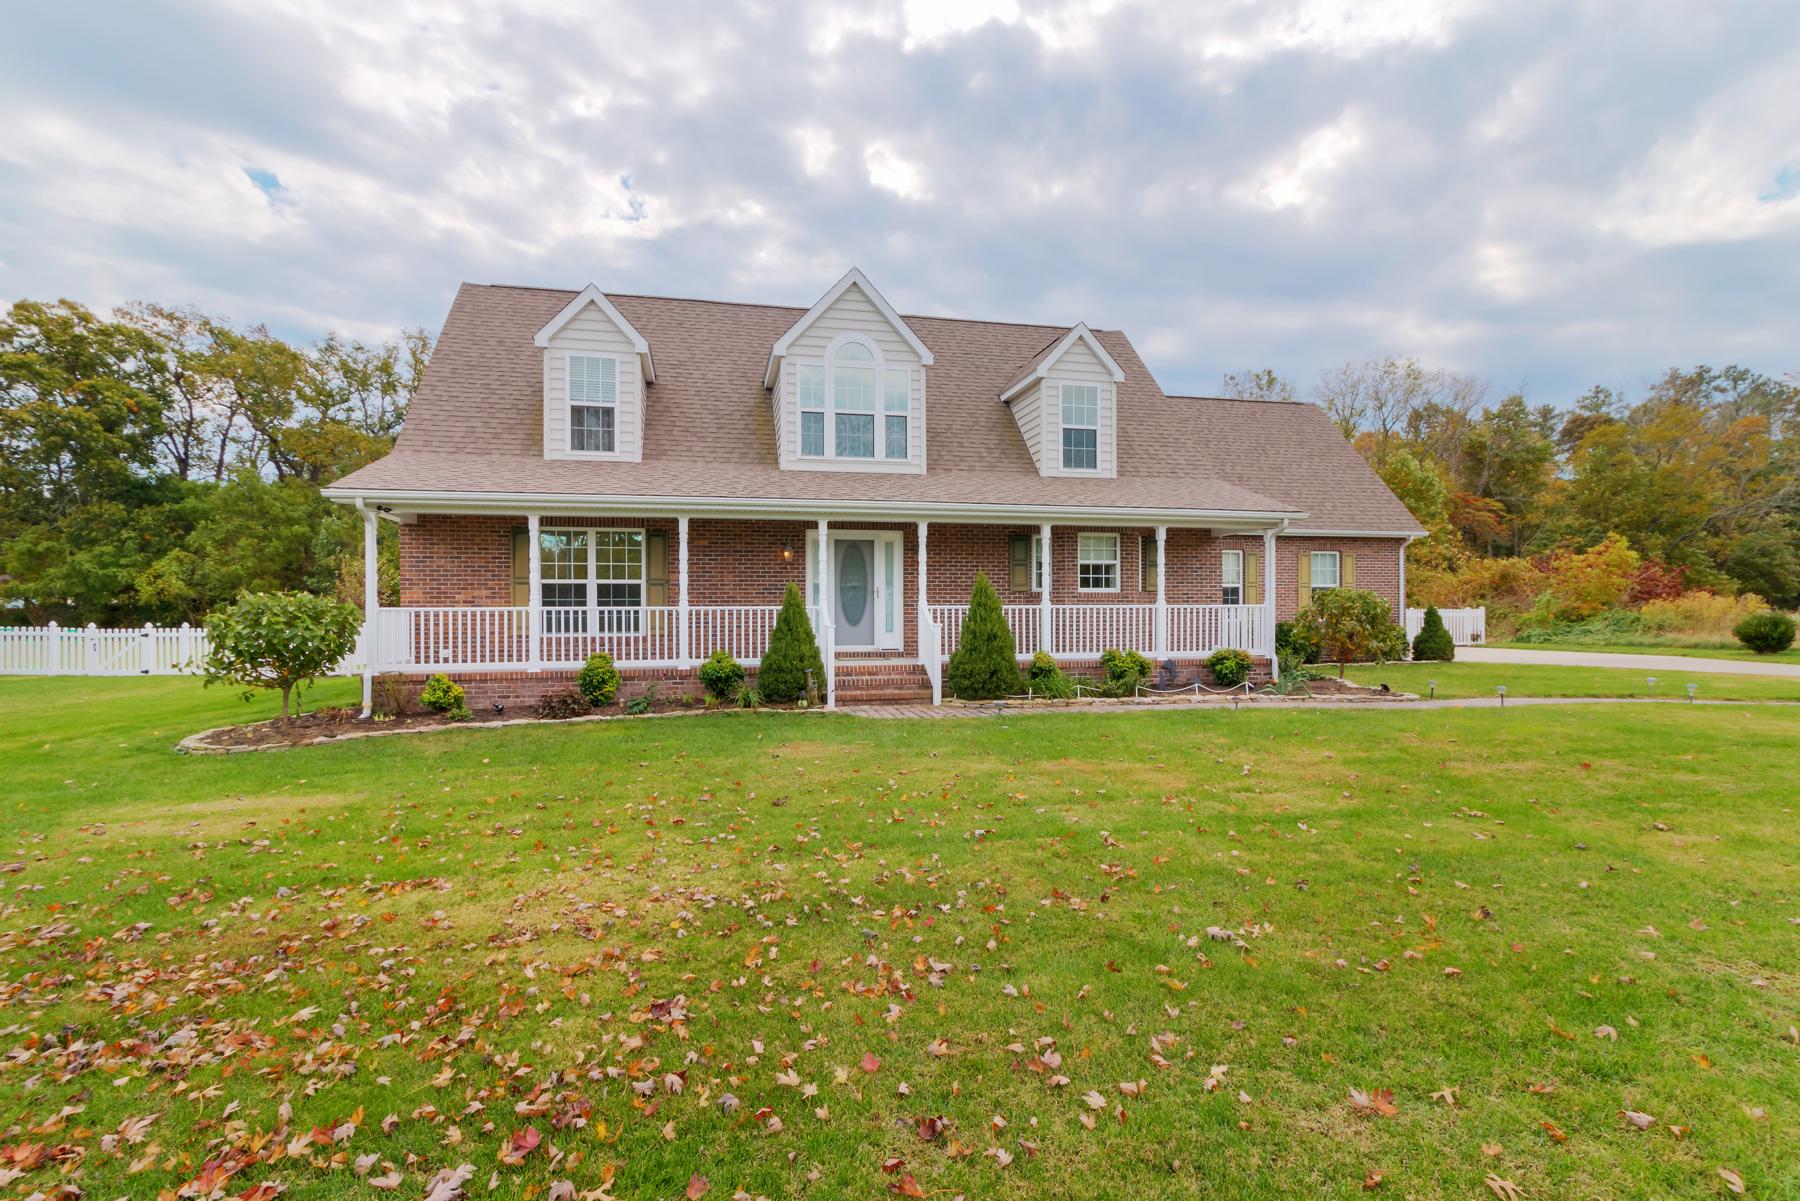 Property For Sale at 32560 Friendship Dr , Millsboro, DE 19966